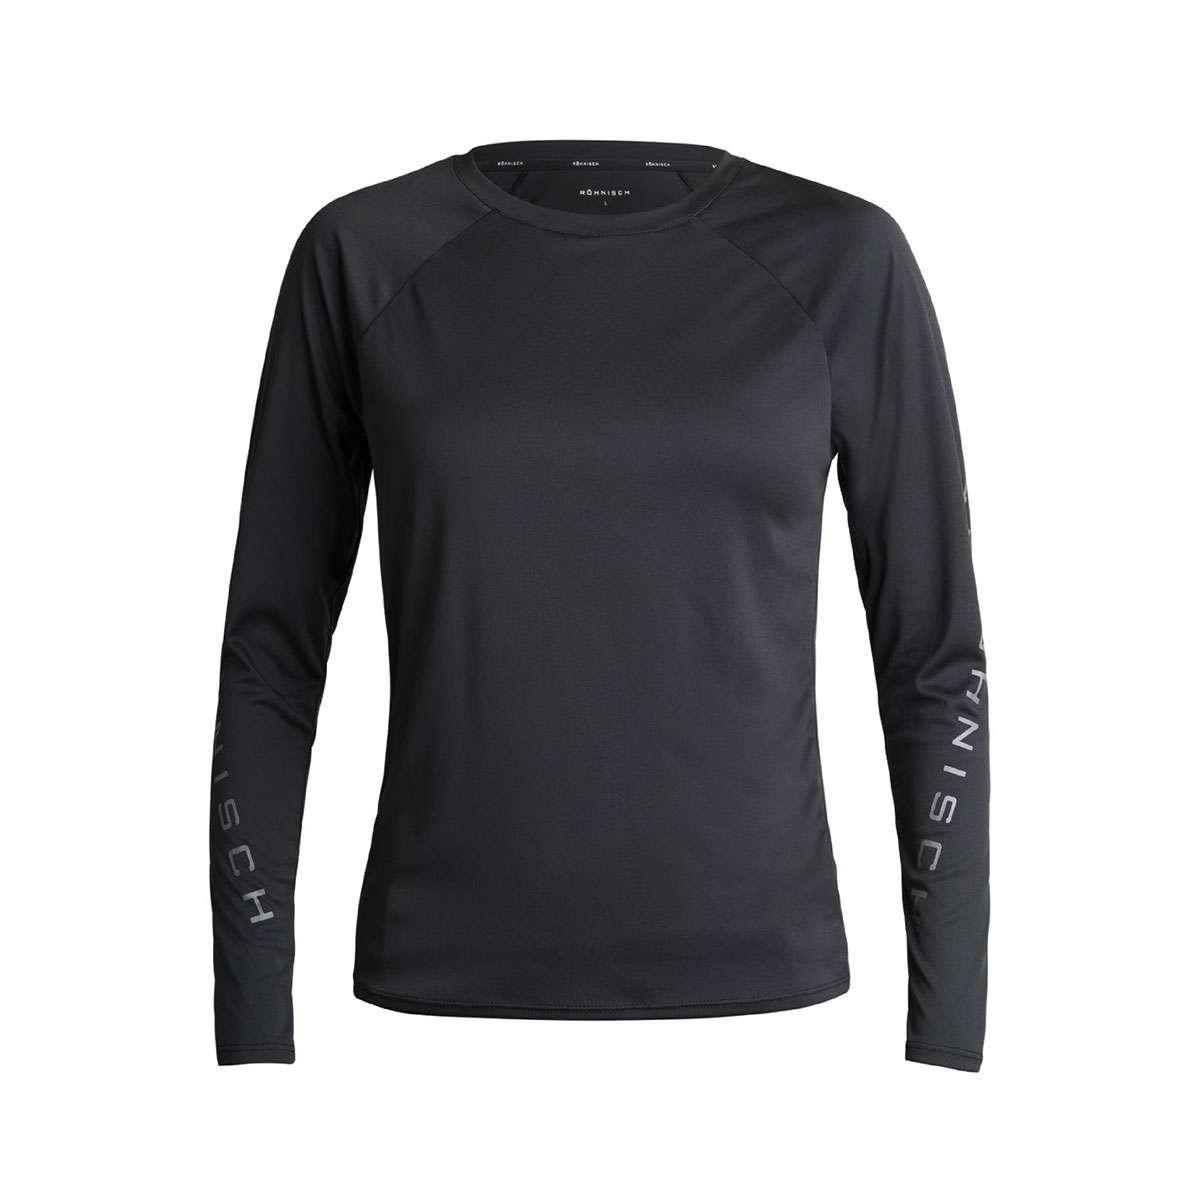 Röhnisch Active Logo Hardloopshirt Lange Mouwen Zwart Dames